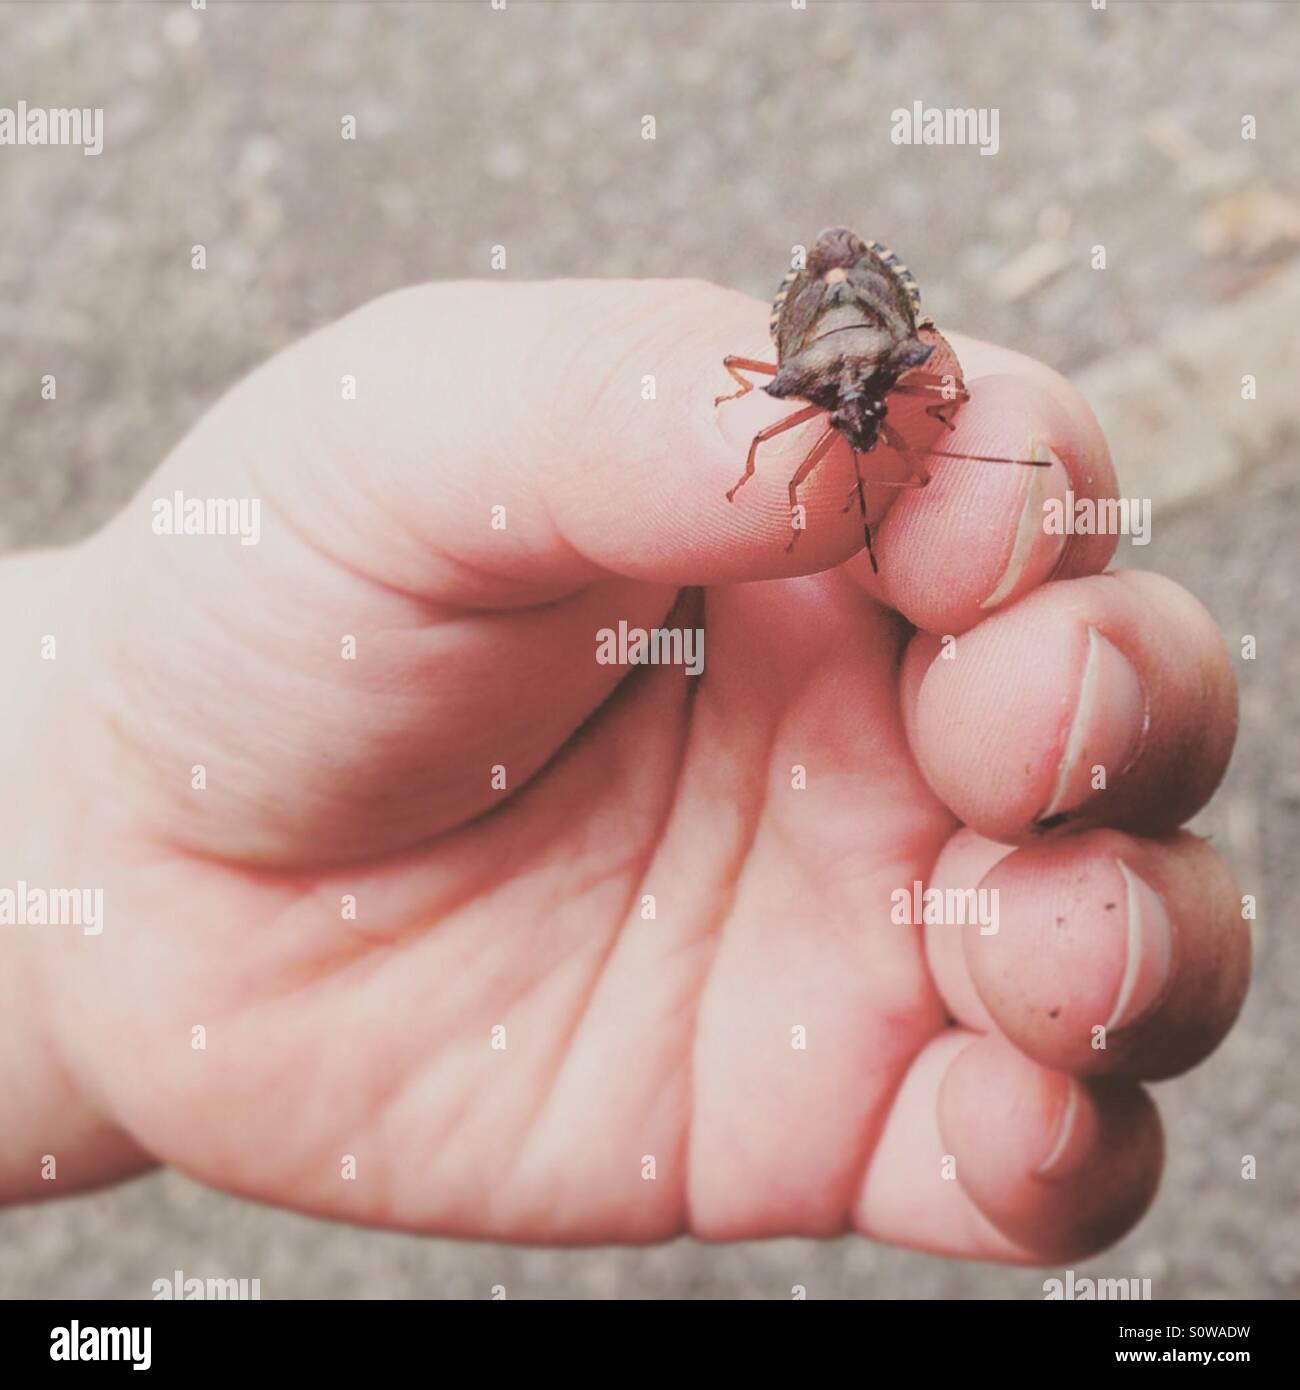 Child holding a bug - Stock Image